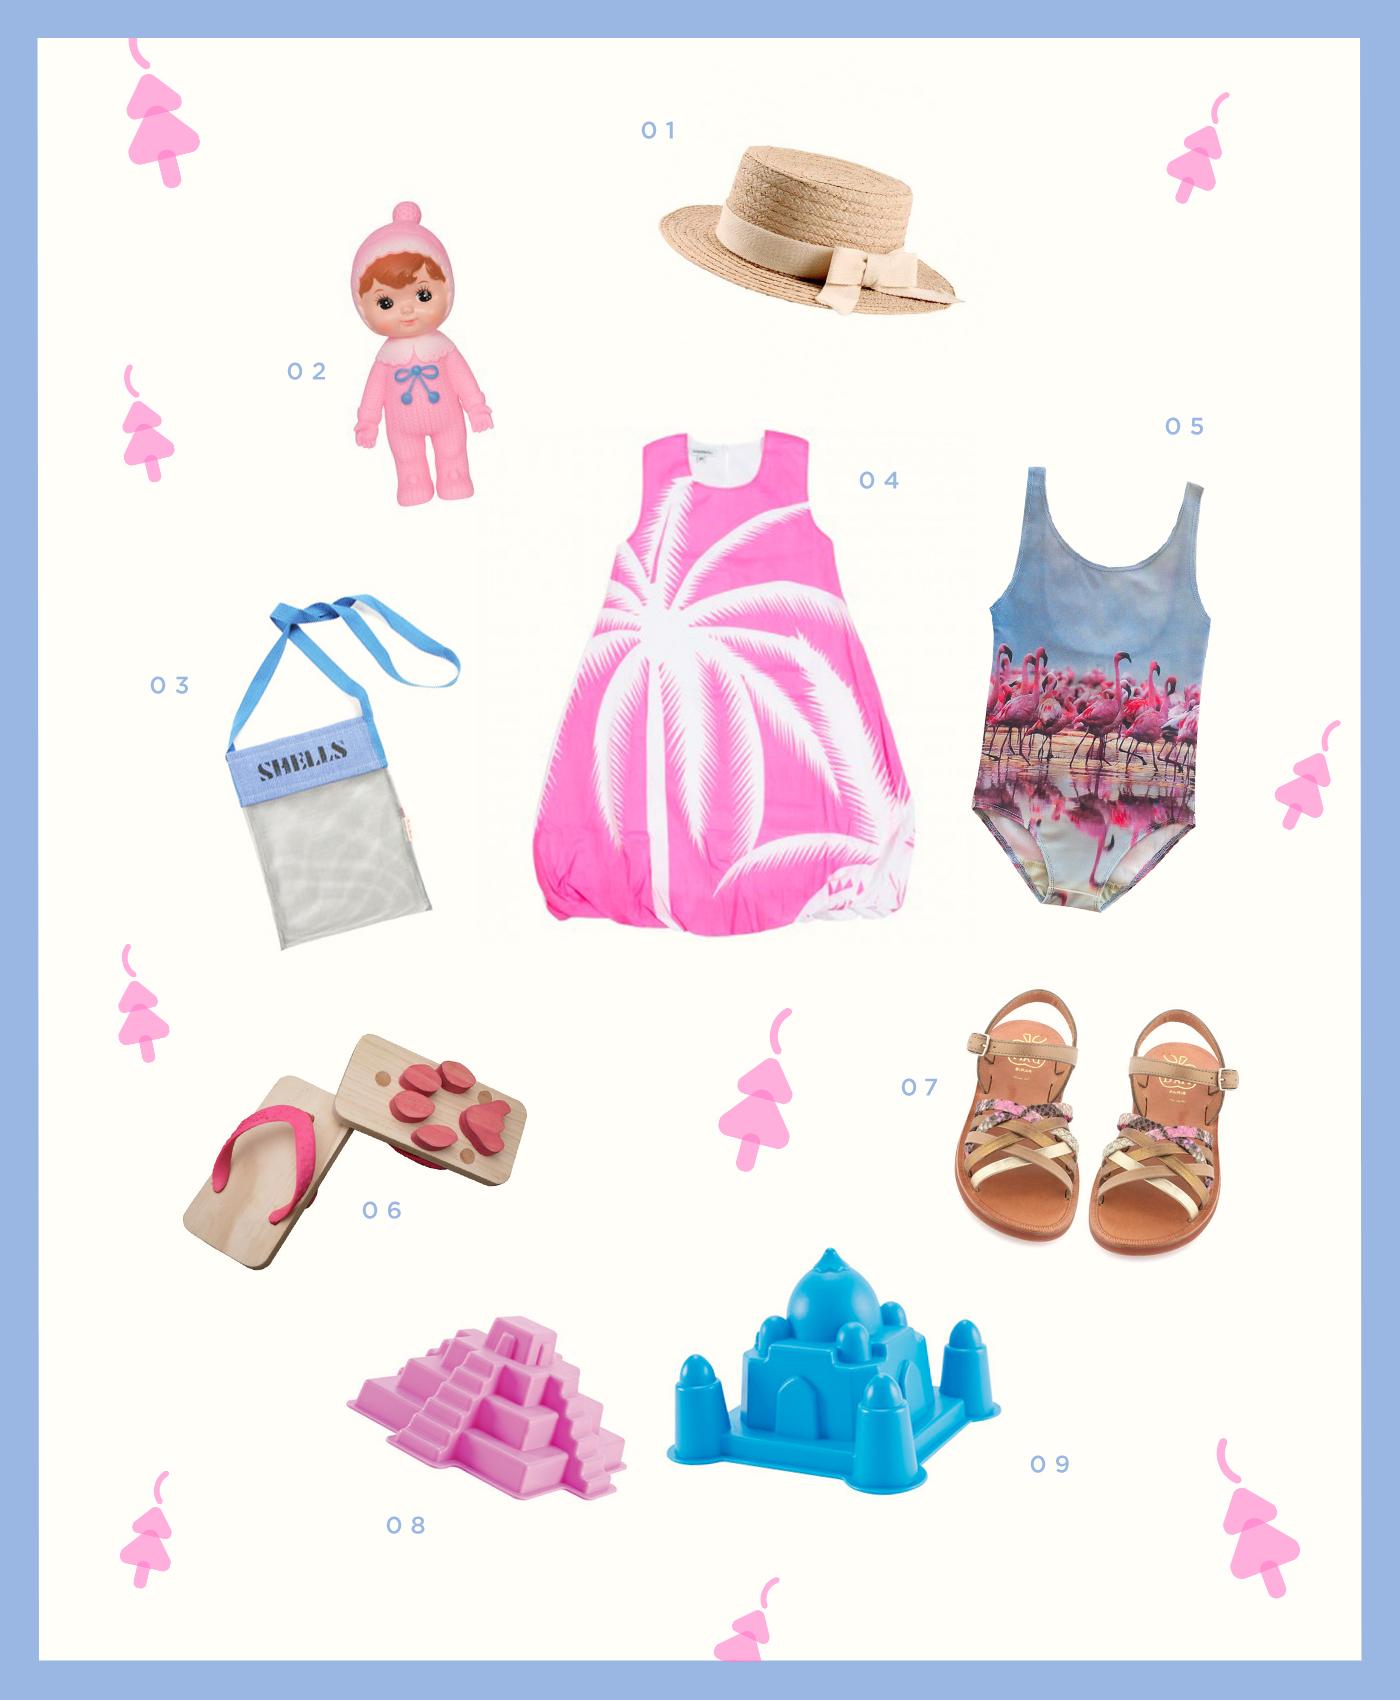 Weekend-on-Paradise-Cove-Beach-Malibu-Daughter-Look-Maison-Mittweg